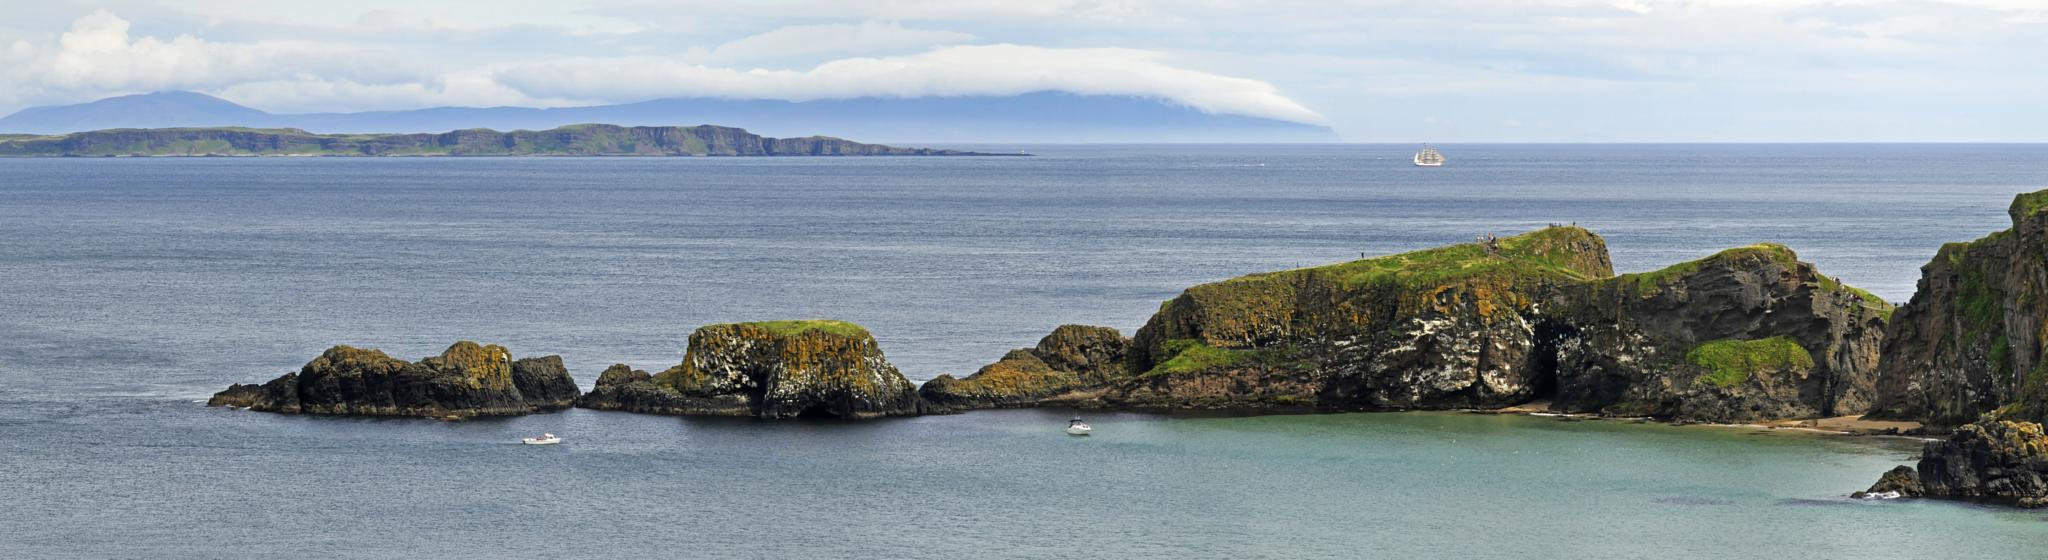 Photo in Landscape #ireland #carrick-a-rede #scotland #coast #ocean #cloud #rope bridge #tall ship